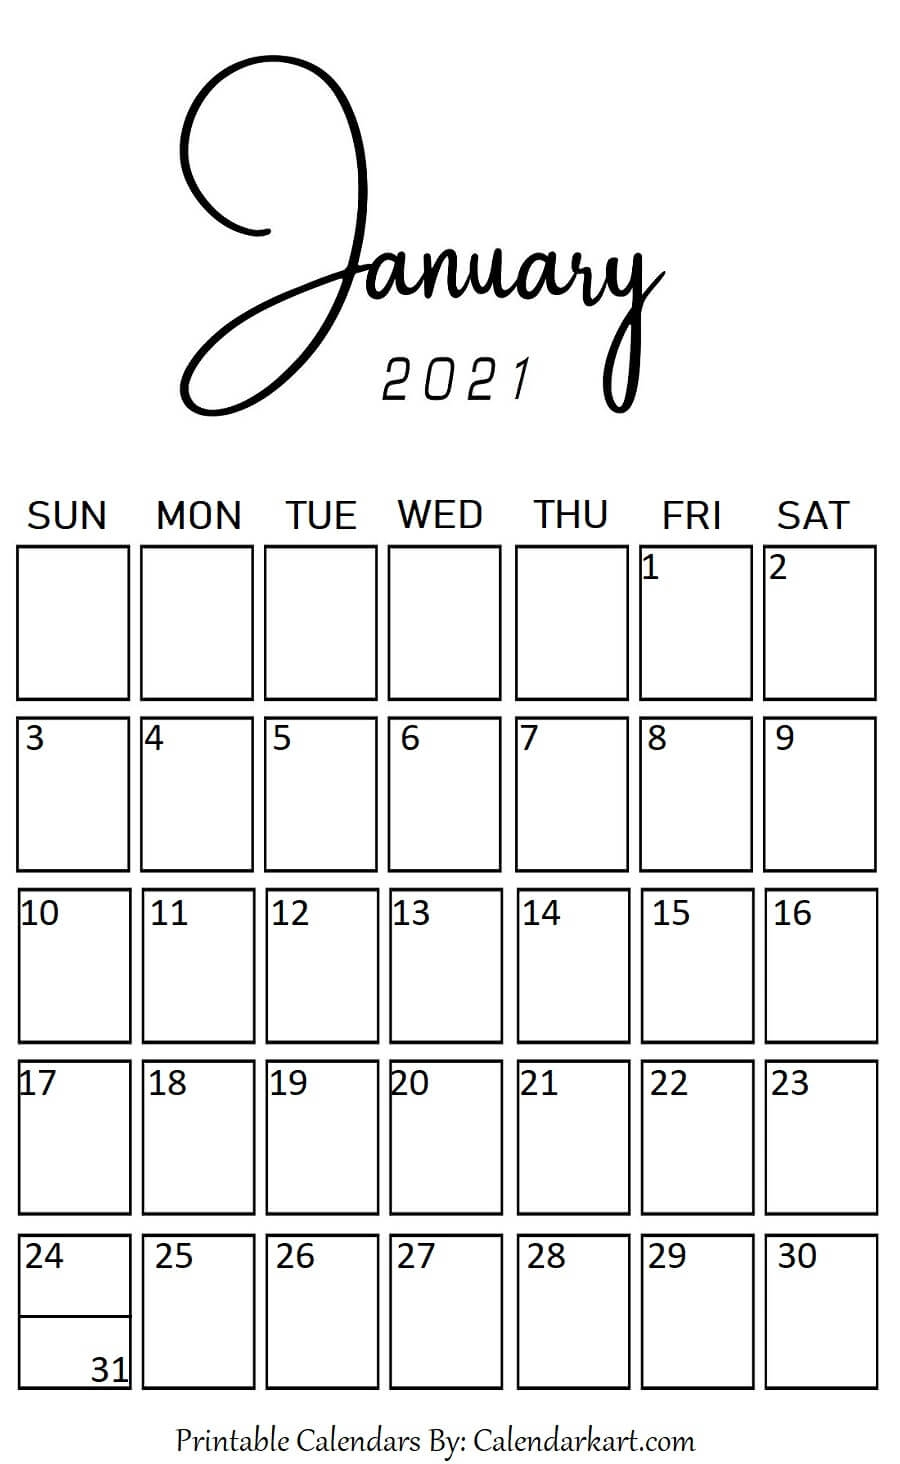 January 2021 Portrait (Vertical) Style Calendar In 2020